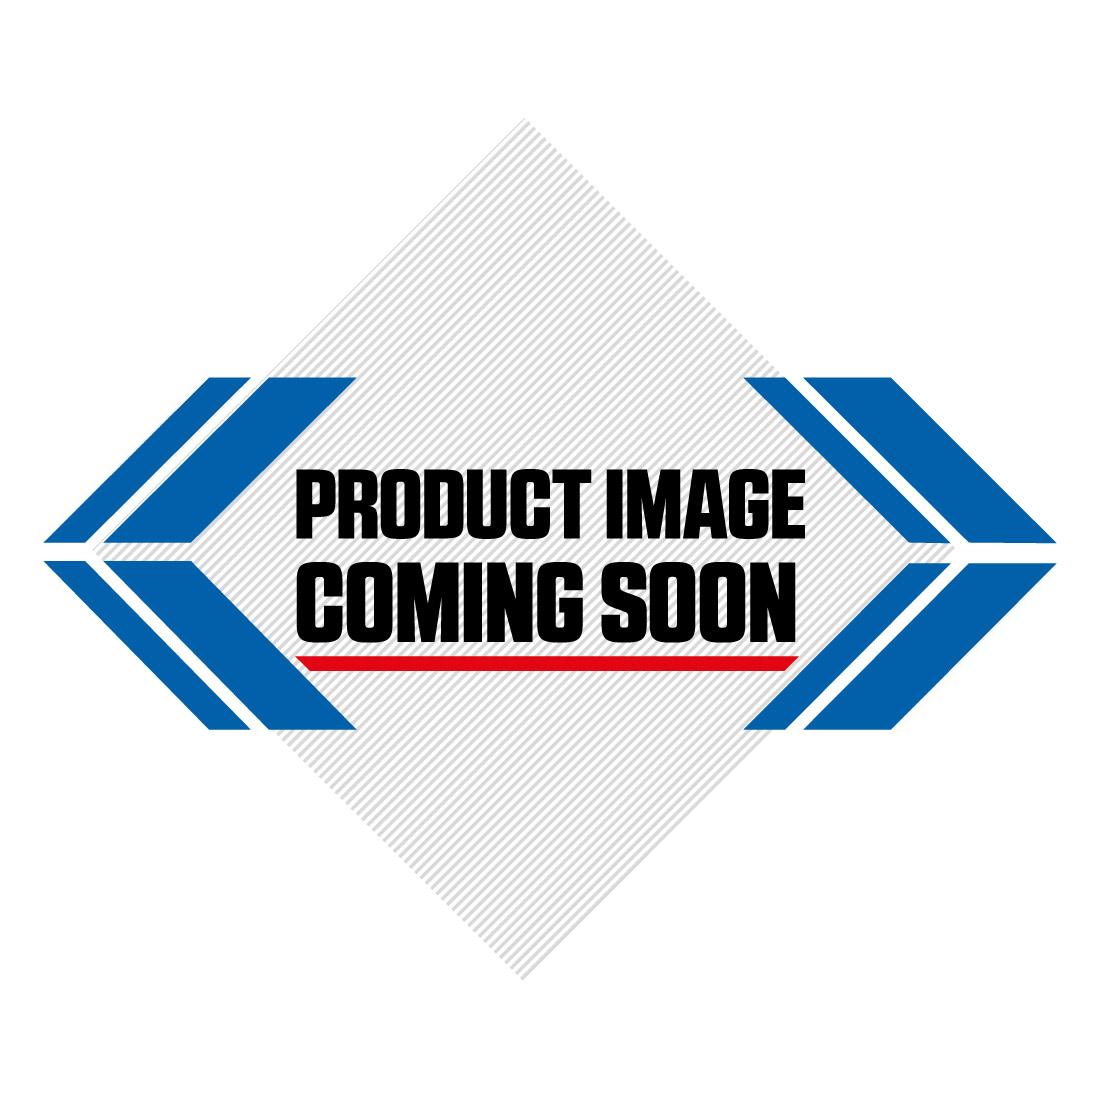 UFO KTM Plastic Kit SX 125 150 250 SXF 250 350 450 (16-18) OEM 16 Image-3>